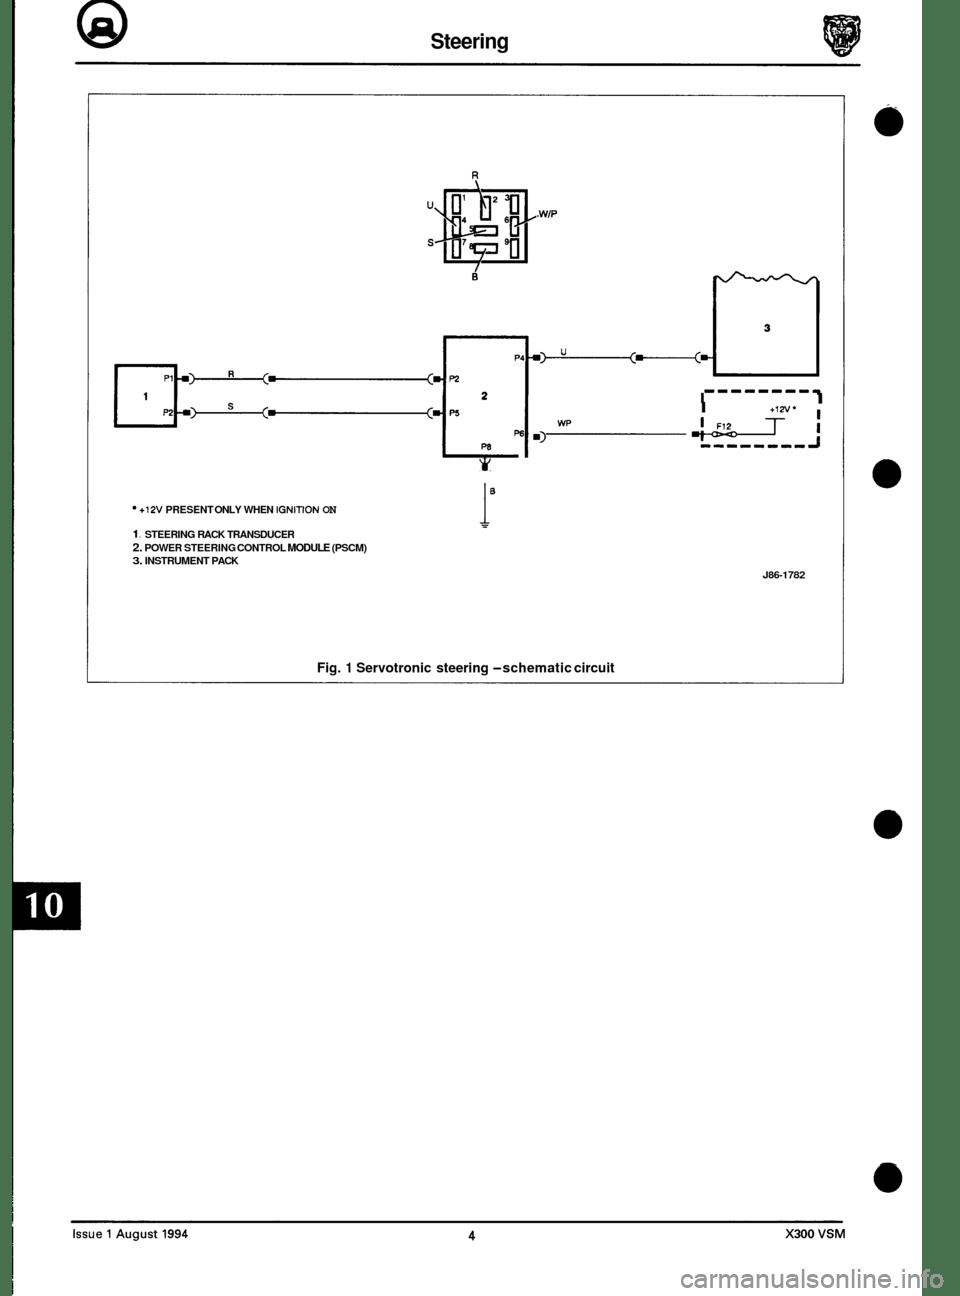 hight resolution of jaguar xj6 ignition wiring schematic